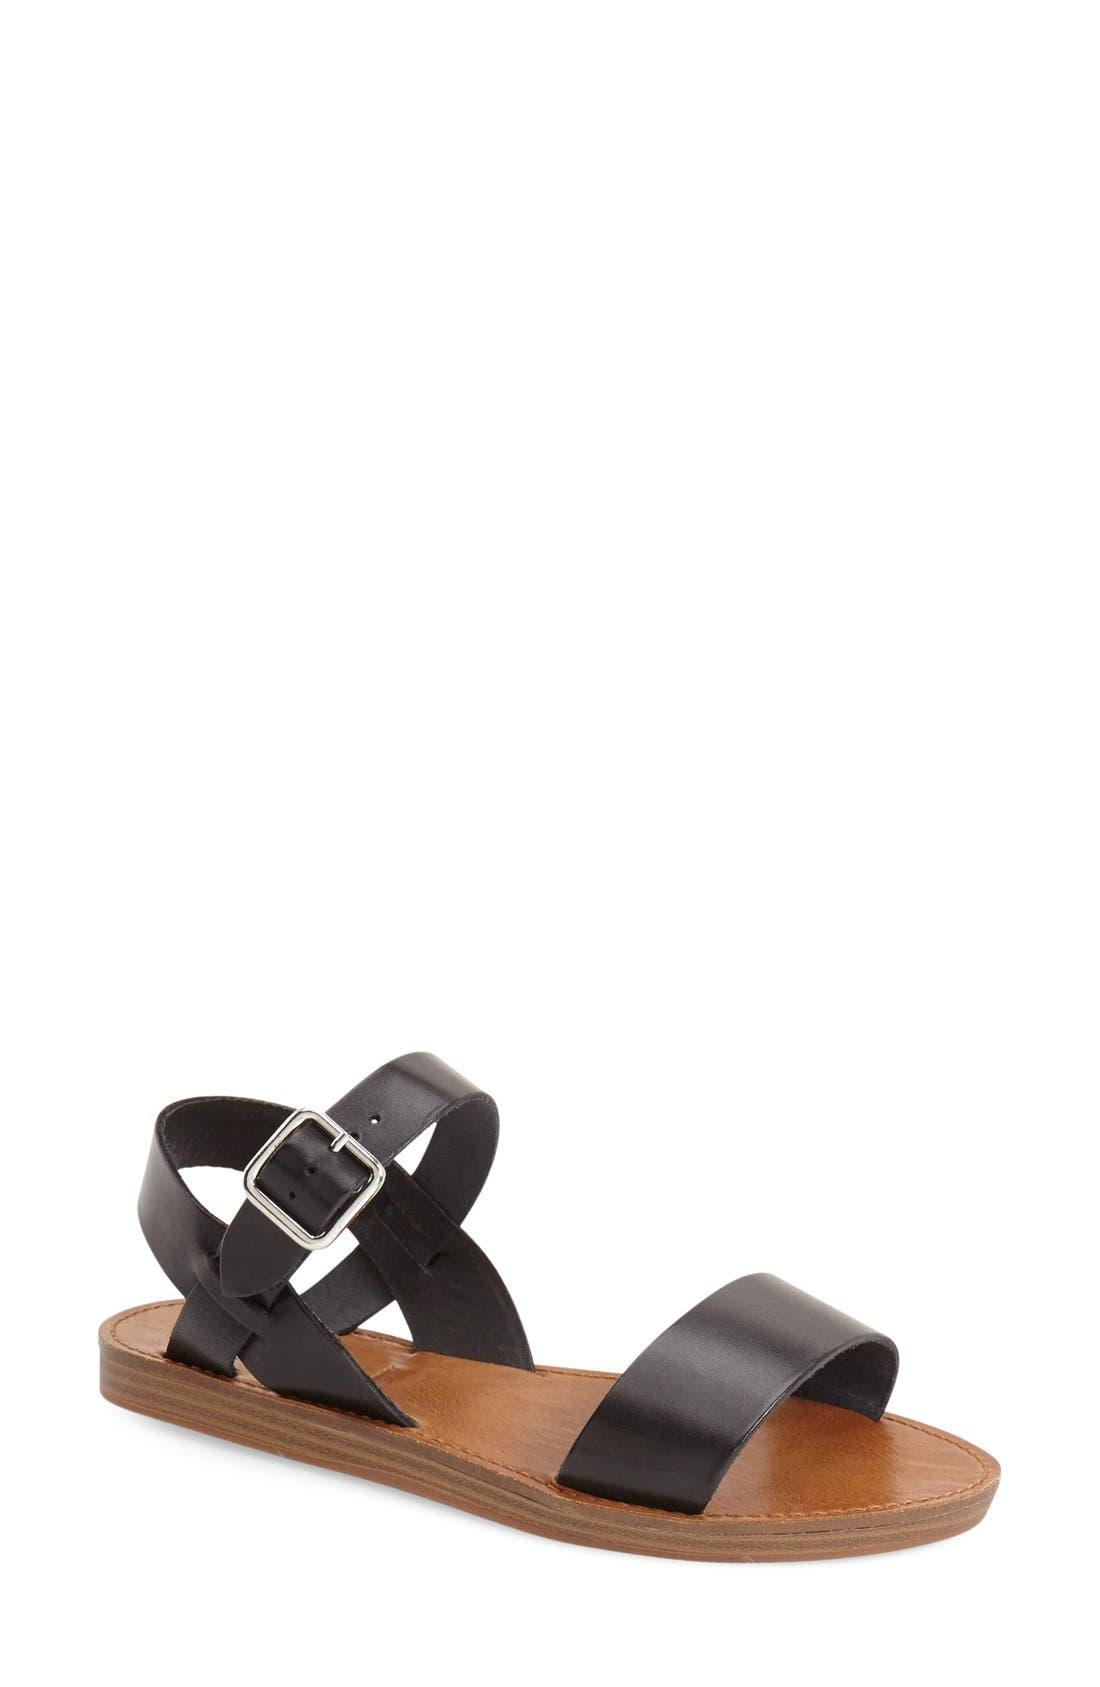 'Bestii' Sandal, Main, color, 001